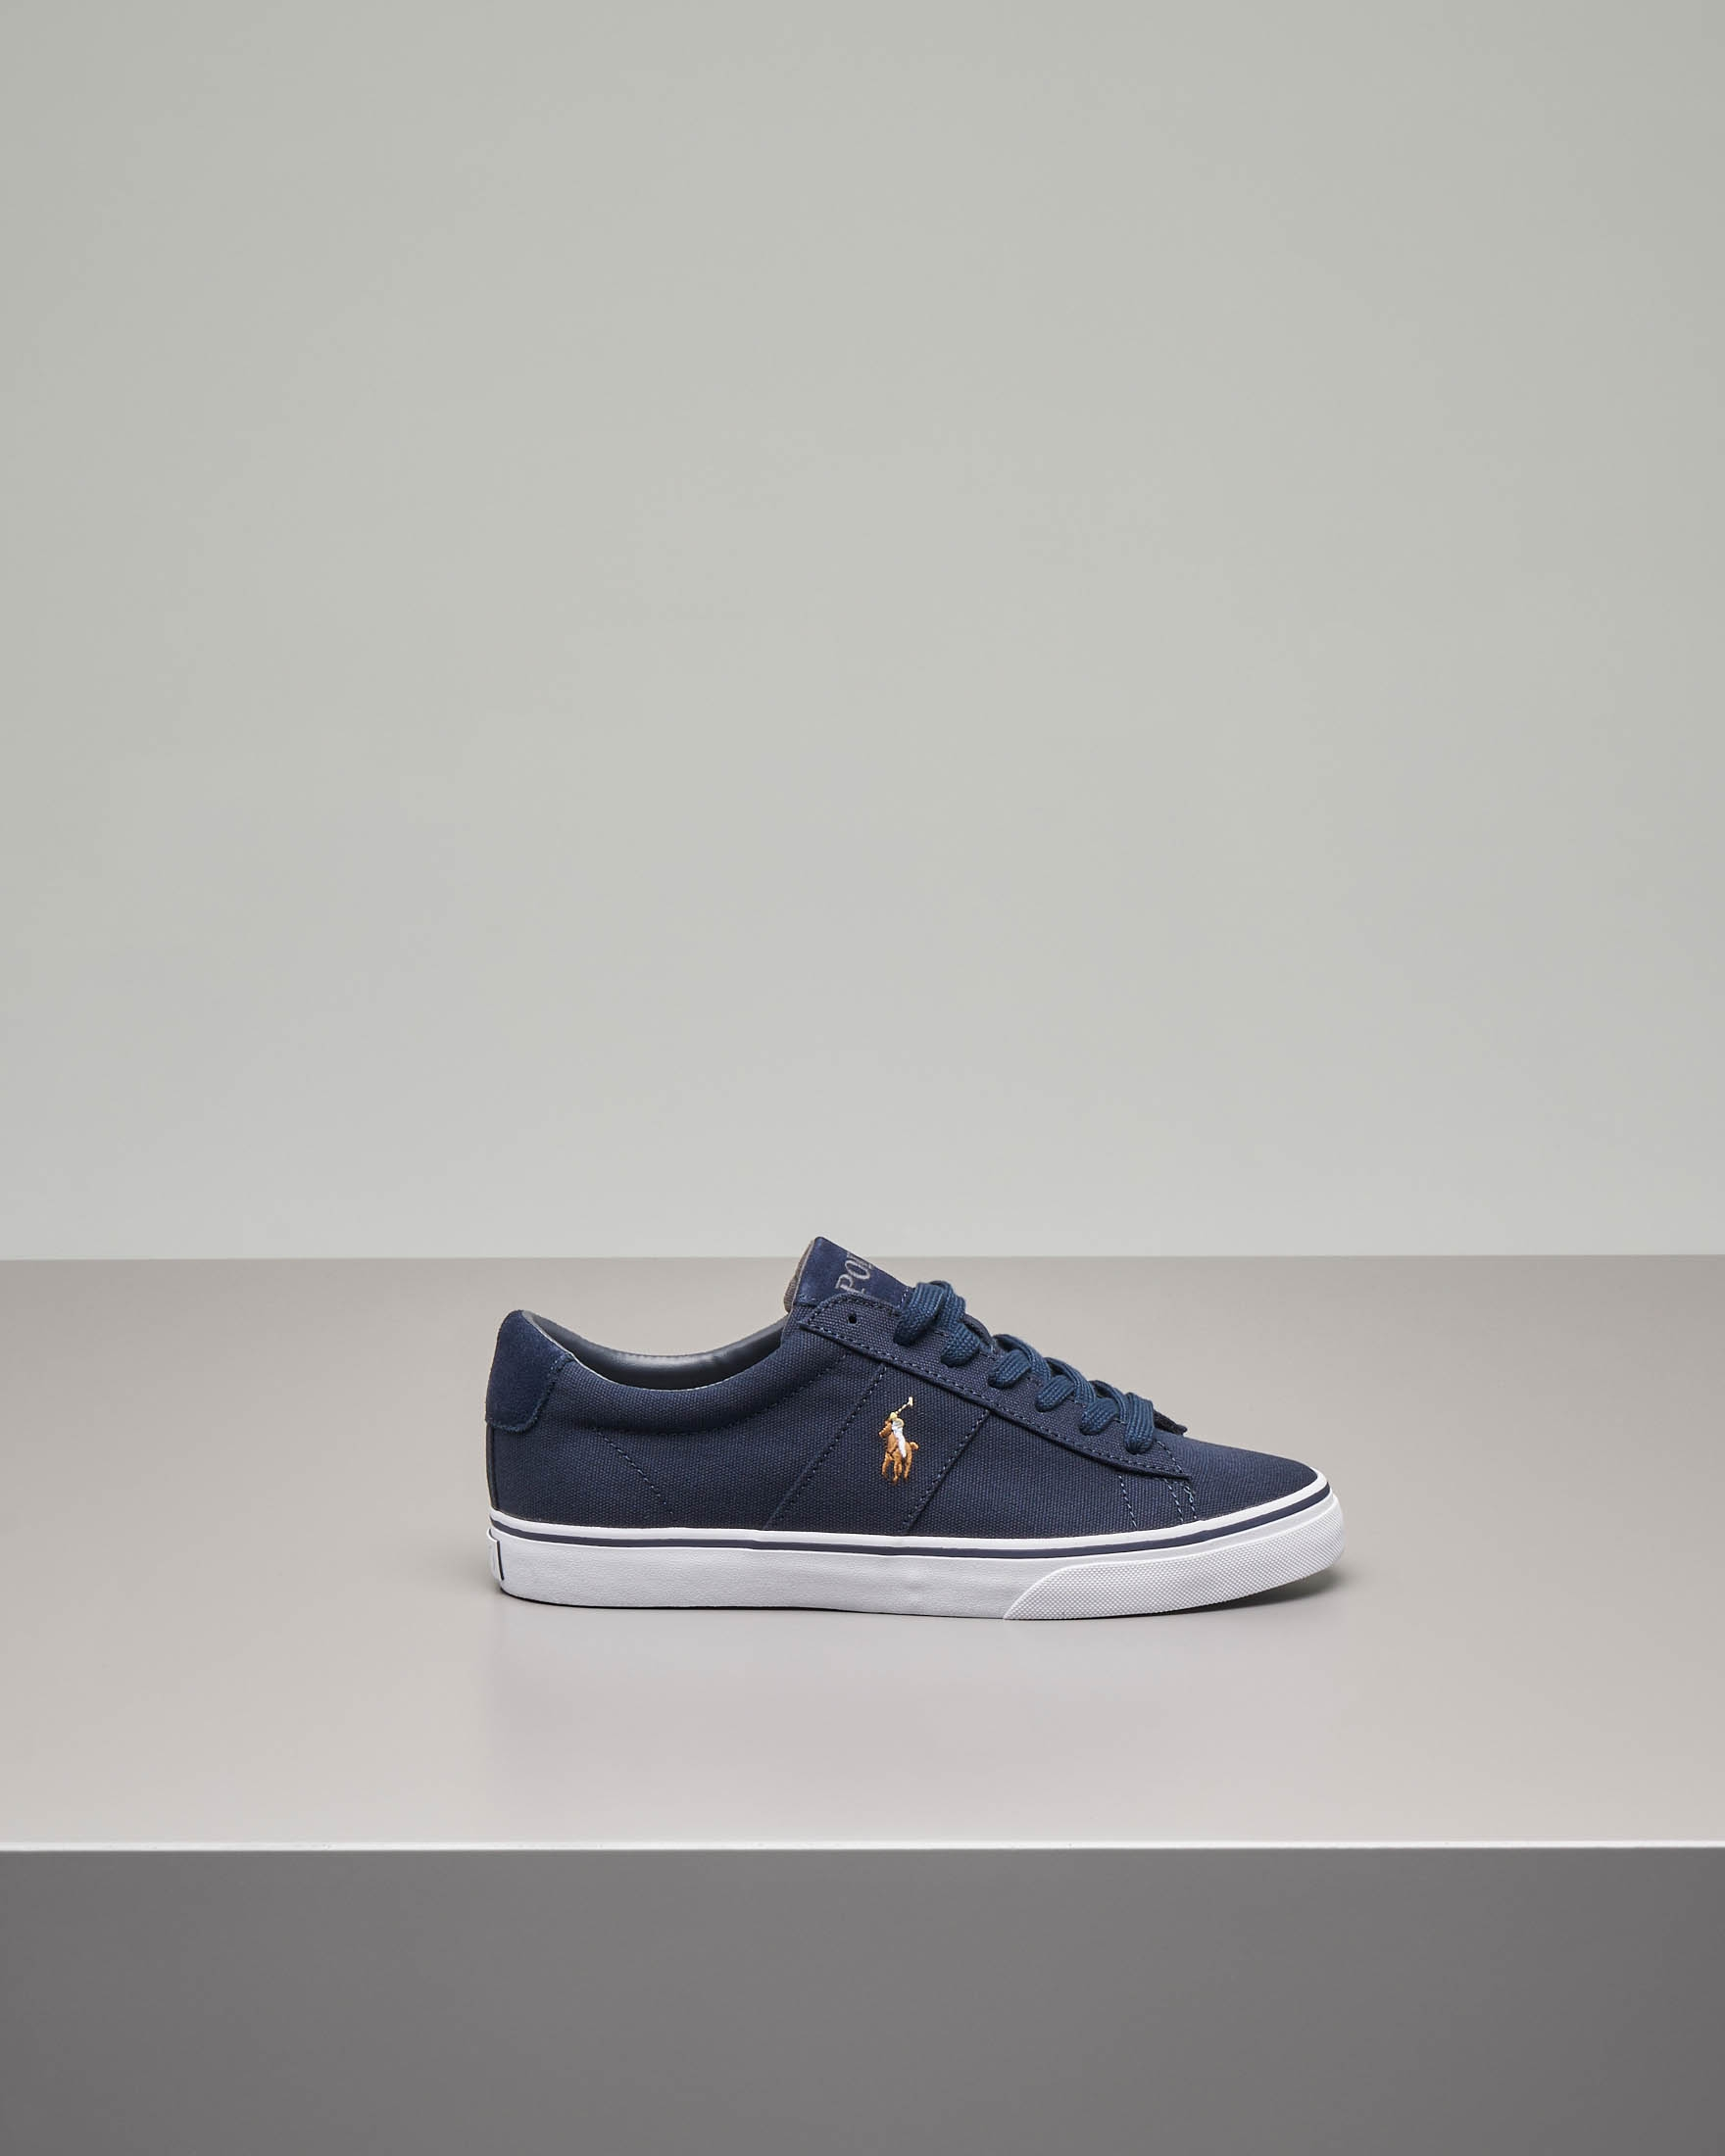 61f9ff236c34df Sneakers Sayer blu in tela | Pellizzari E-commerce